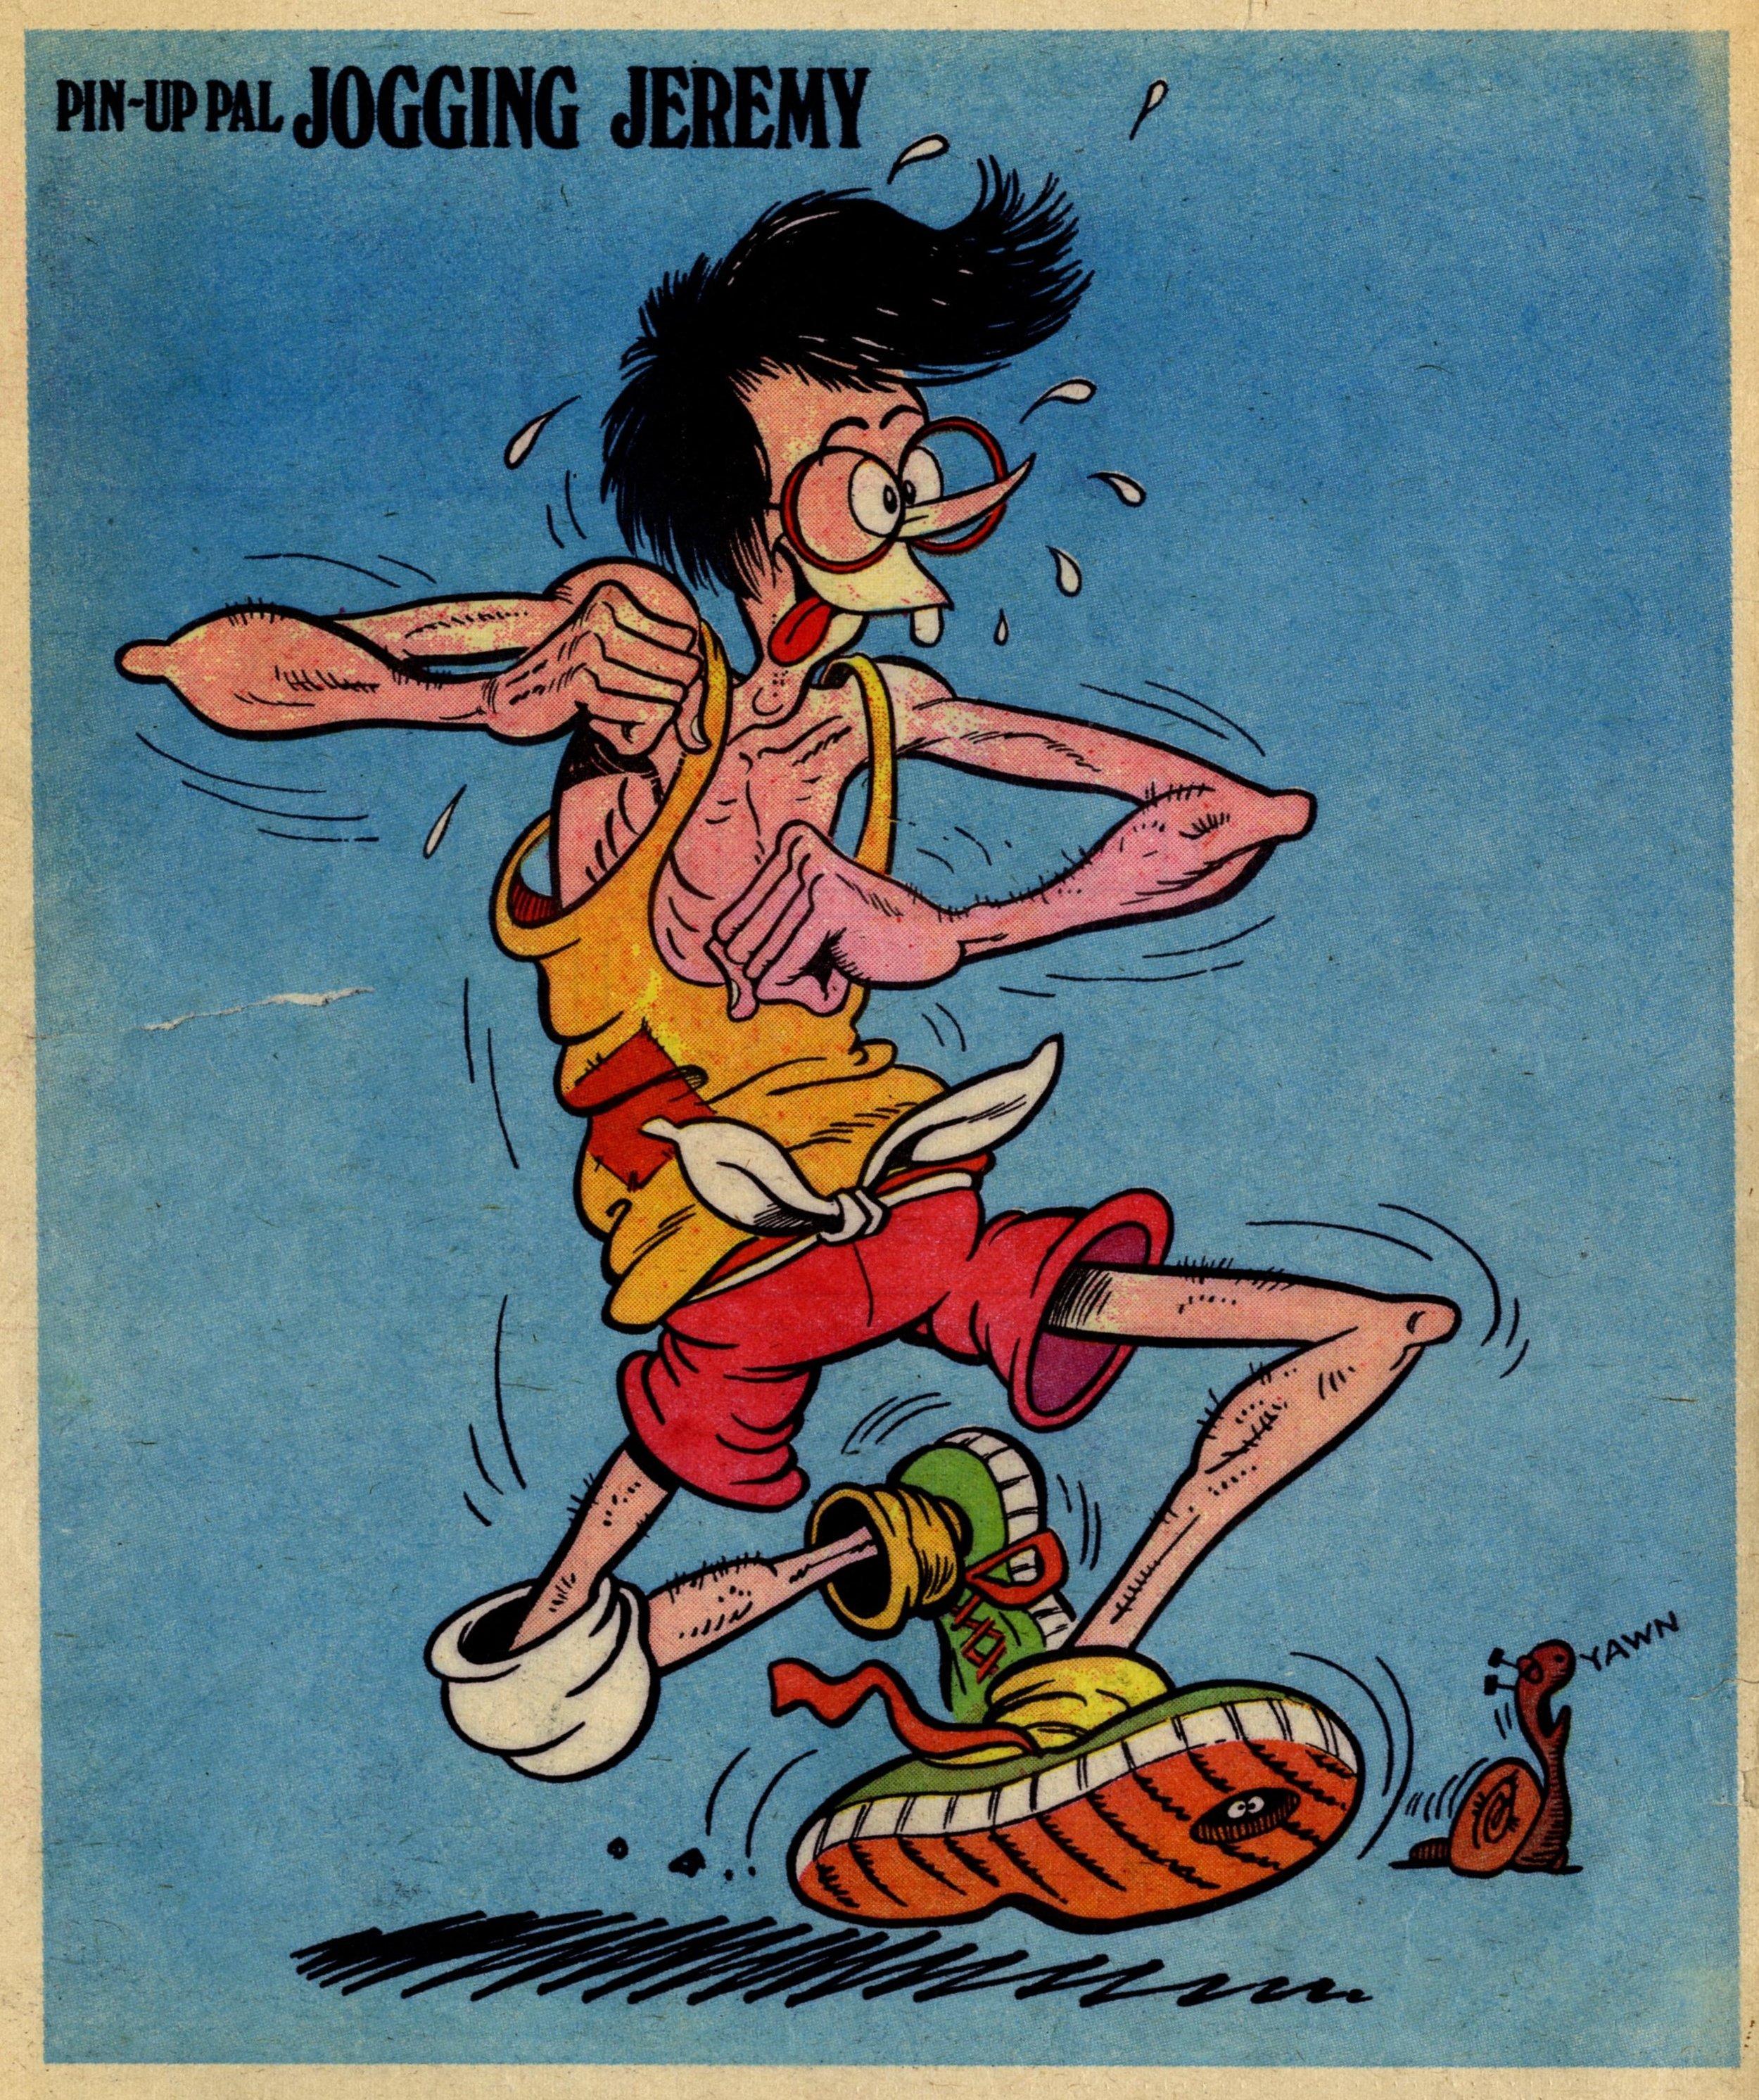 Pin-up Pal: Jogging Jeremy (artist Frank McDiarmid), 25 February 1978